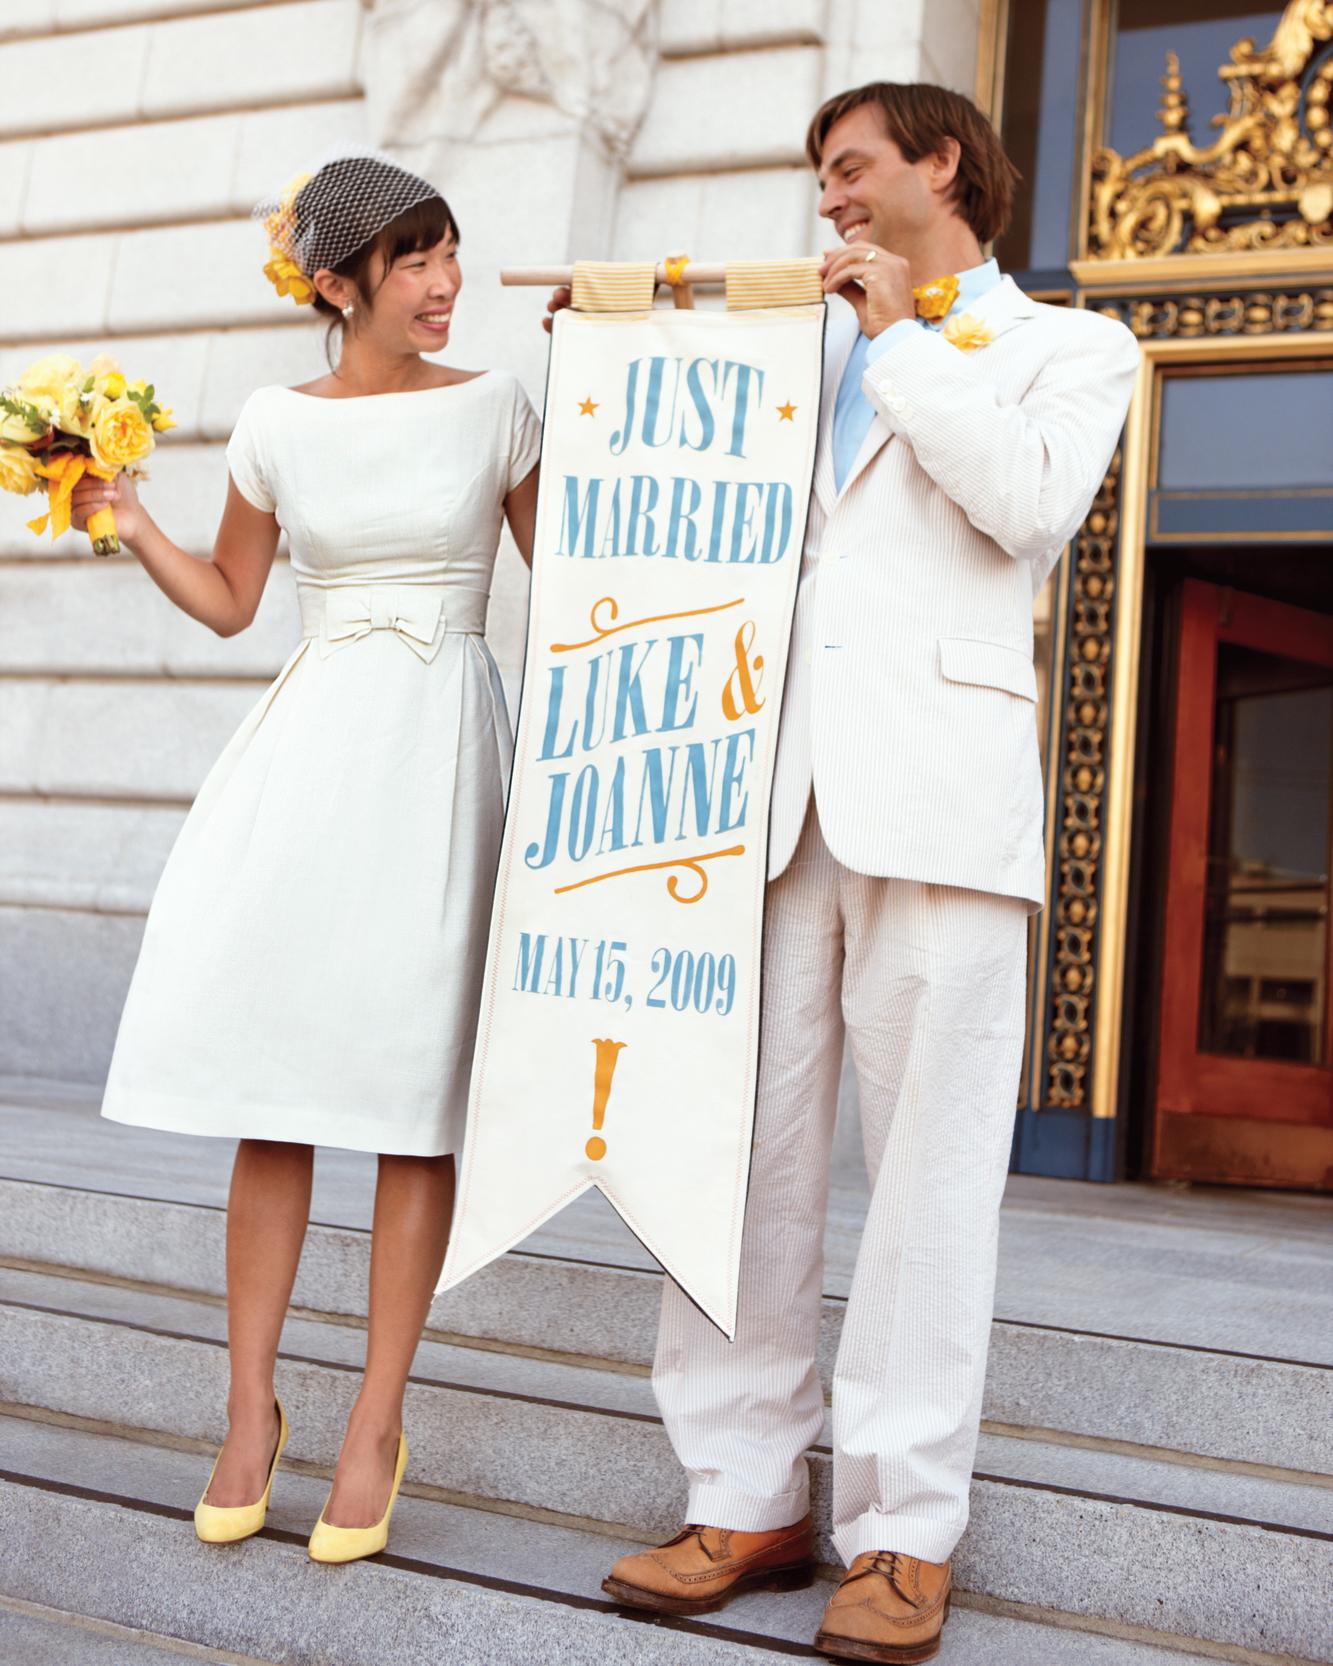 just-married-banner-mwd104950.jpg